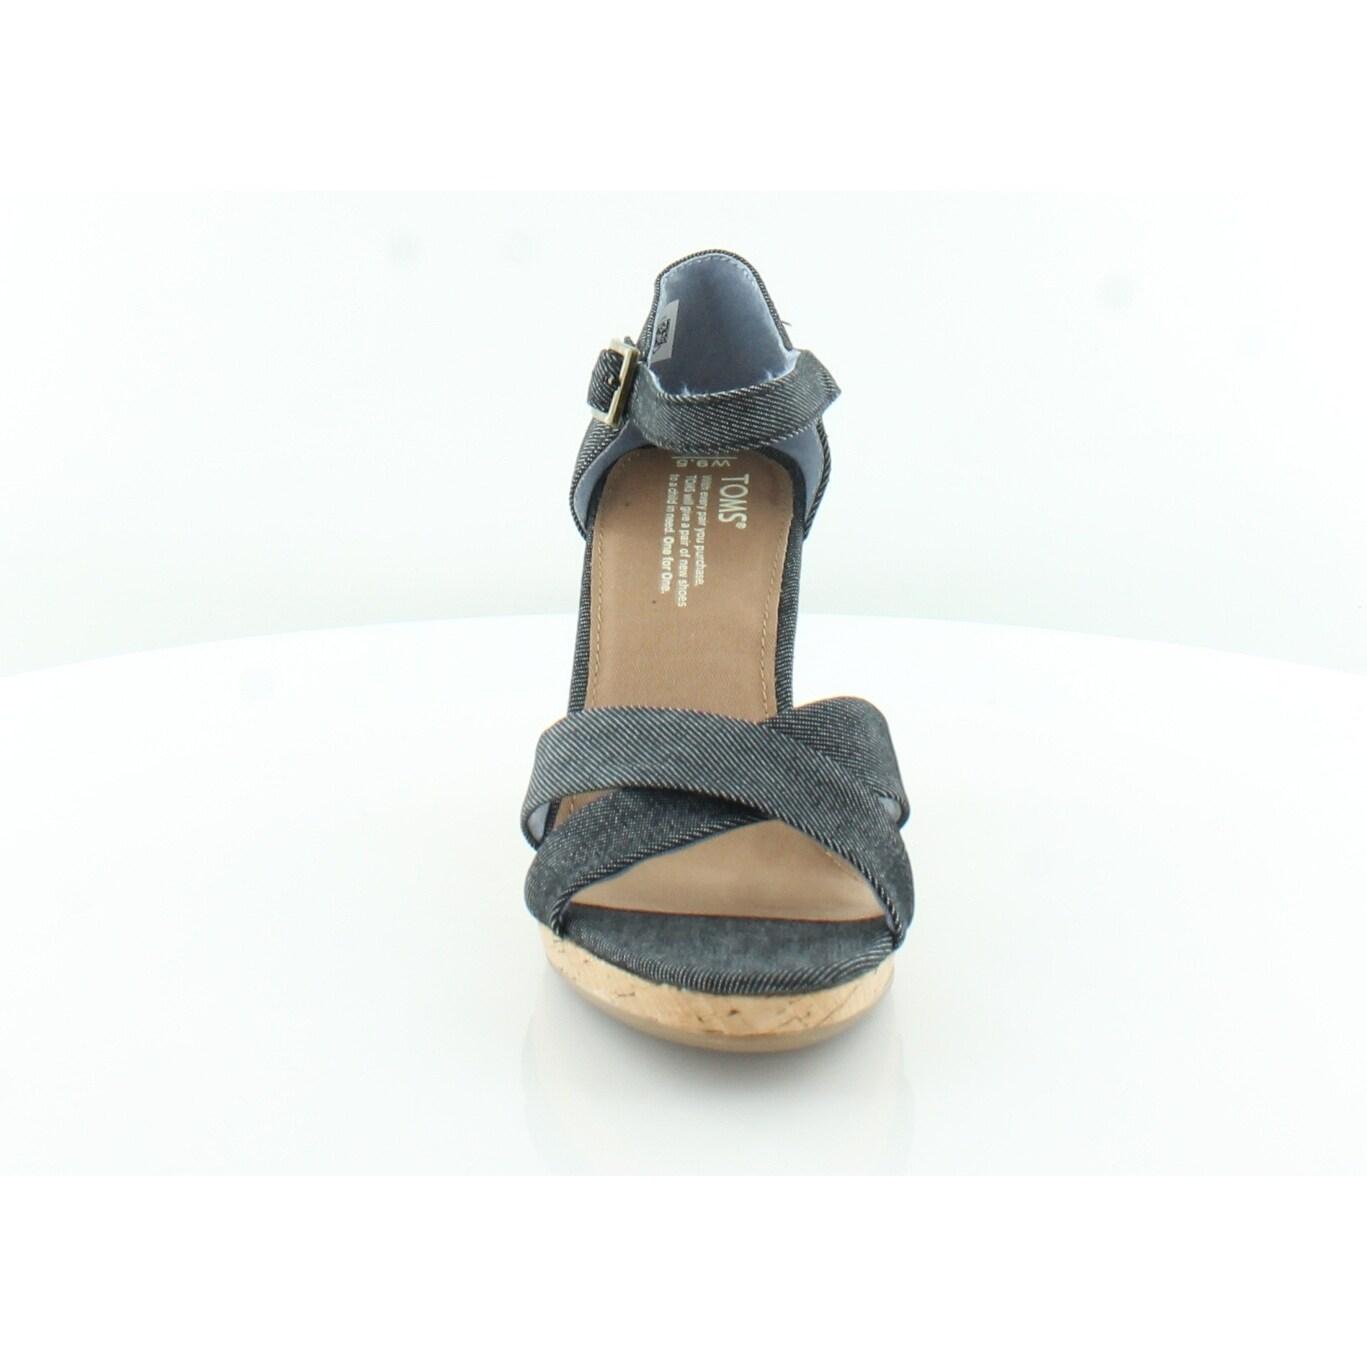 647b39b883 Shop TOMS Classic Sienna Women's Sandals Black Denim - 9.5 - Free Shipping  Today - Overstock - 27568526